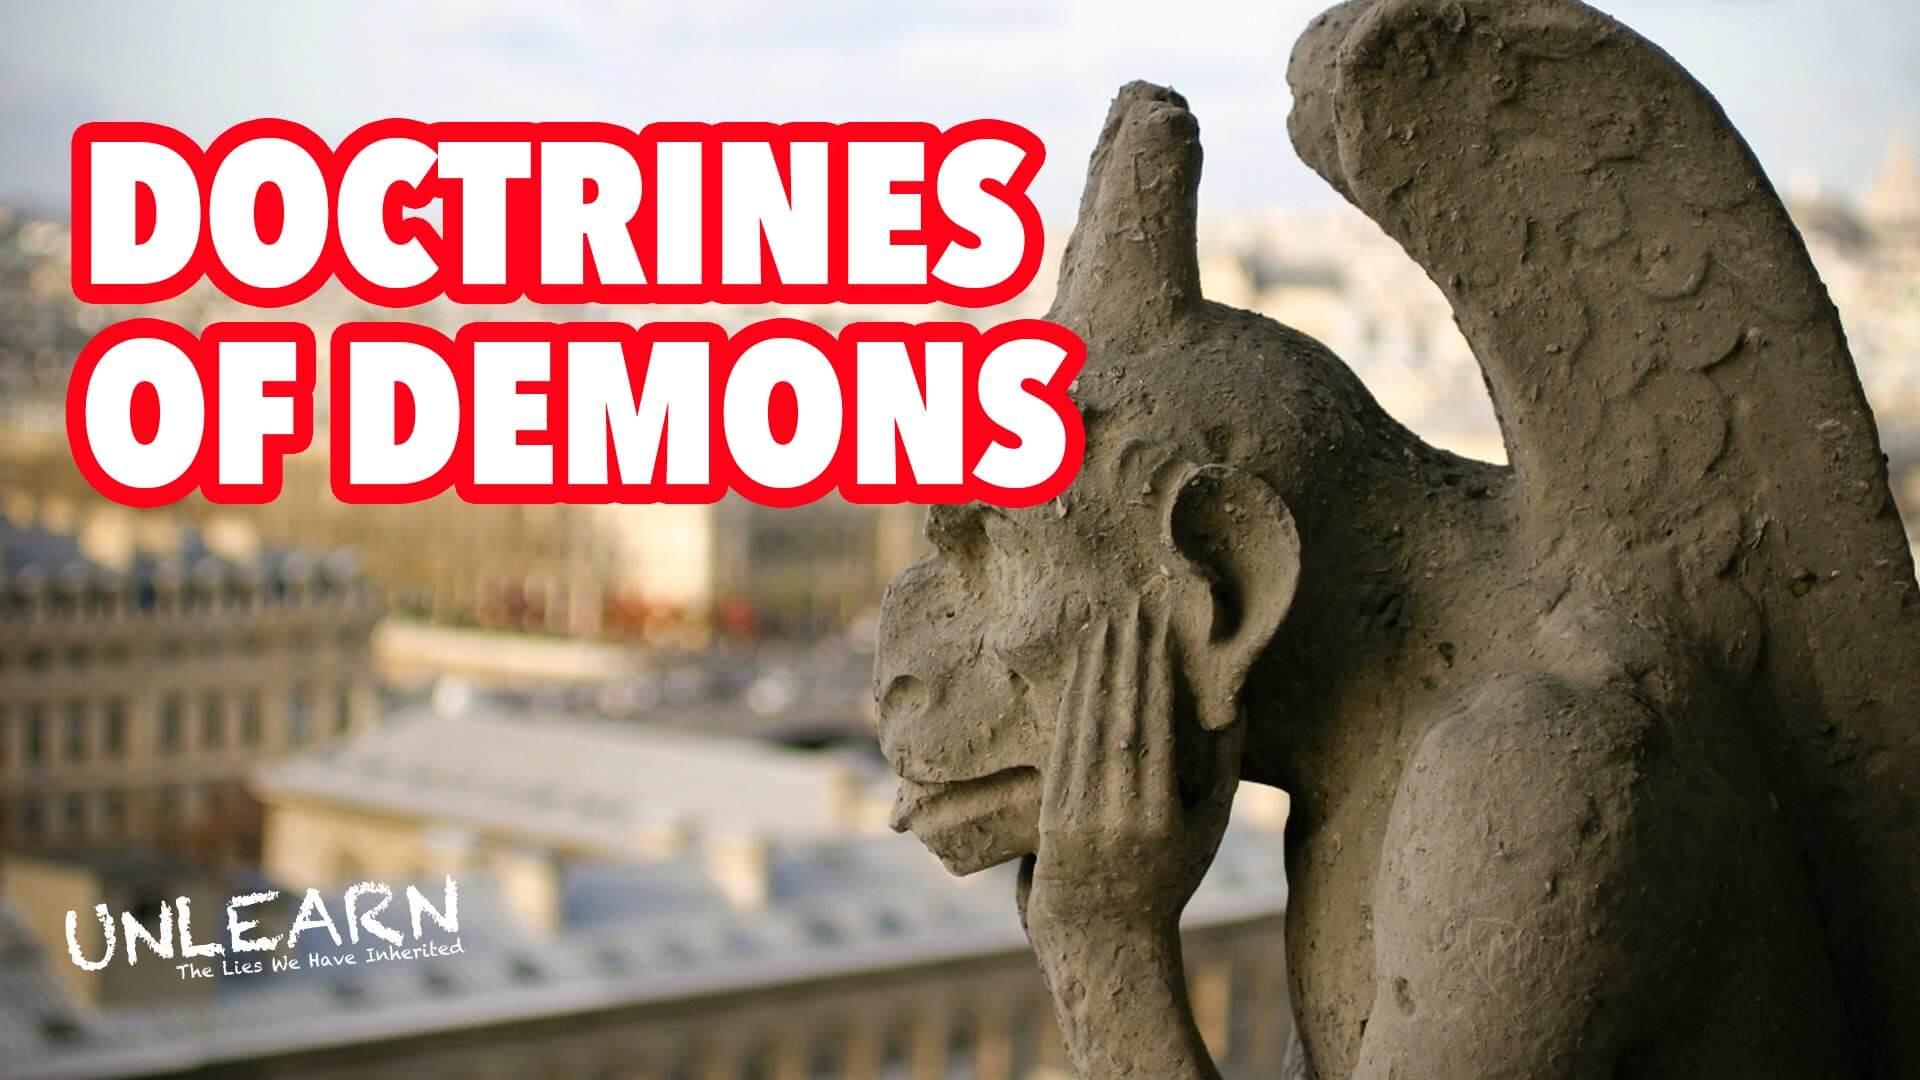 doctrines of demons